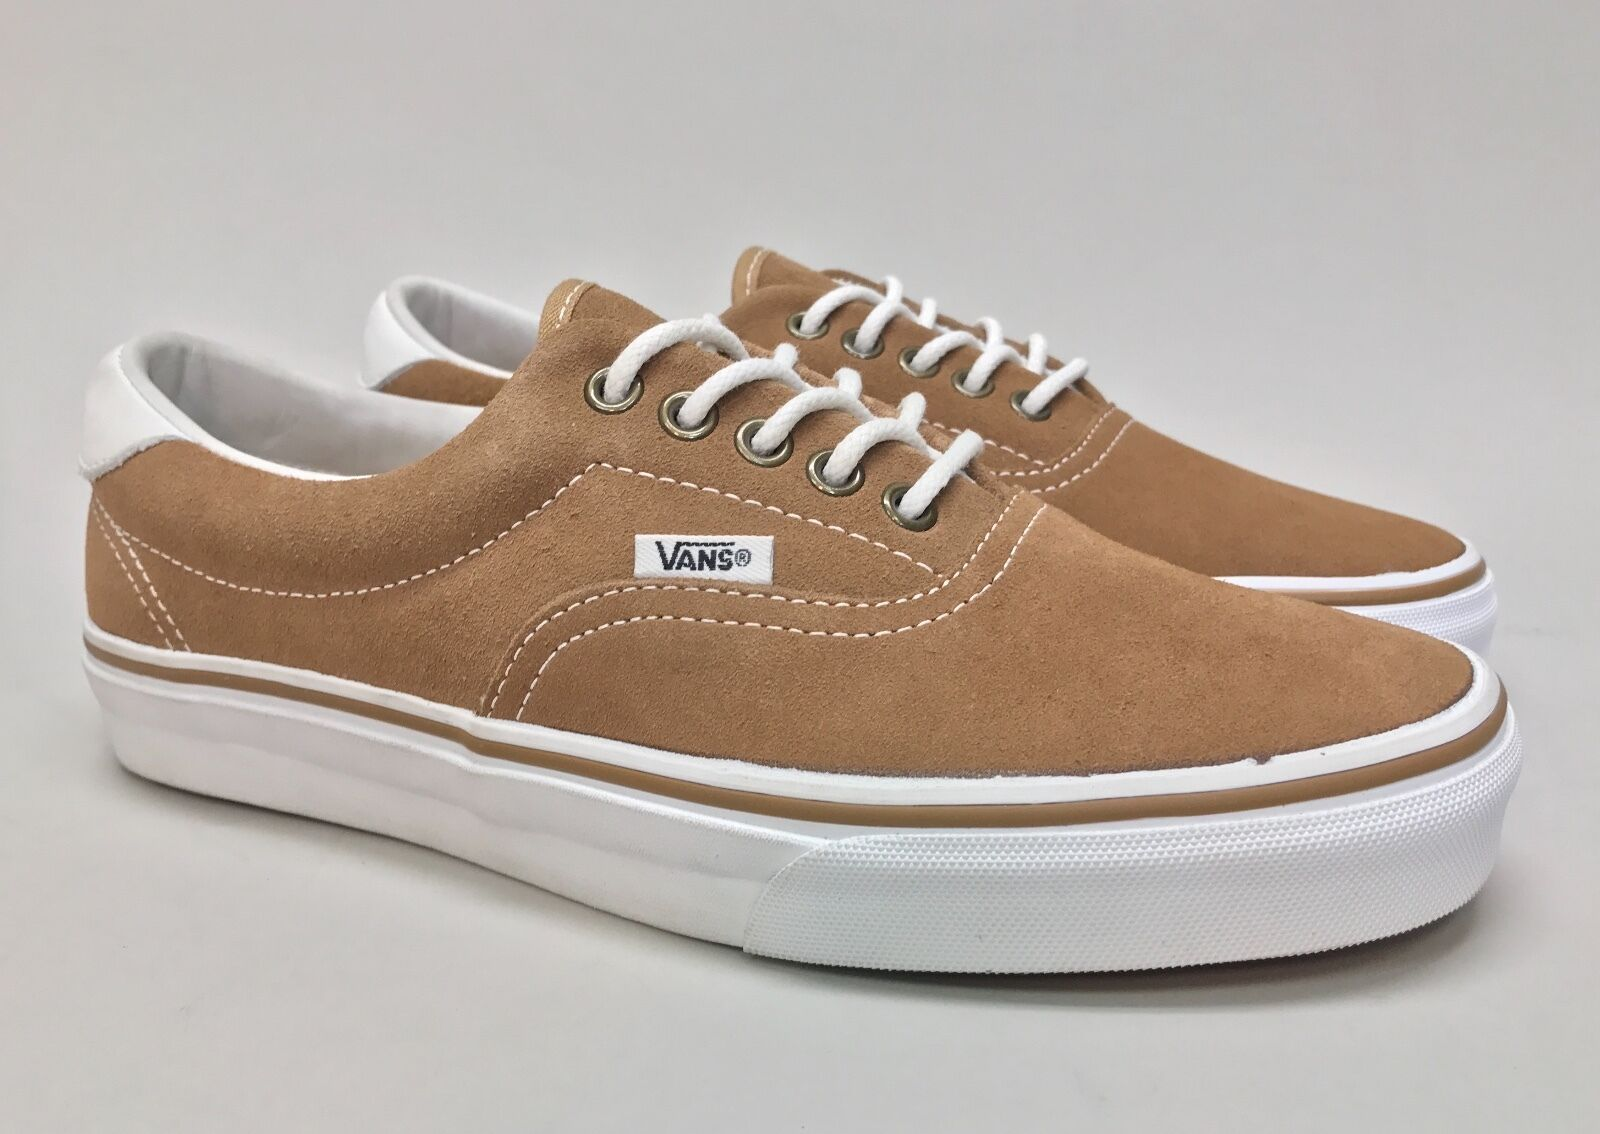 Vans Era Suede Tobacco US Brown MEN'S Size 8 US Tobacco NEW! bca921